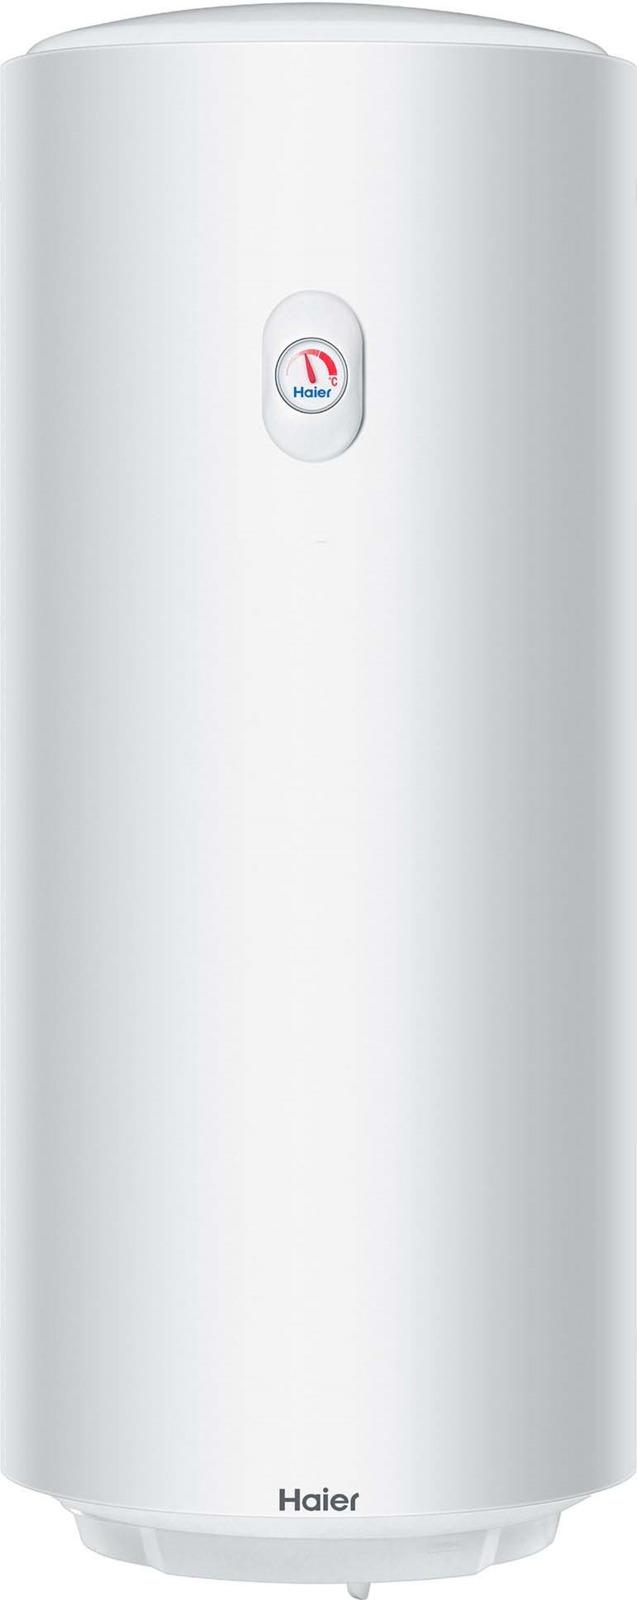 Водонагреватель Haier ES80V-A3 HS, 90000011753, белый анод магниевый м100407 210d22 10m6